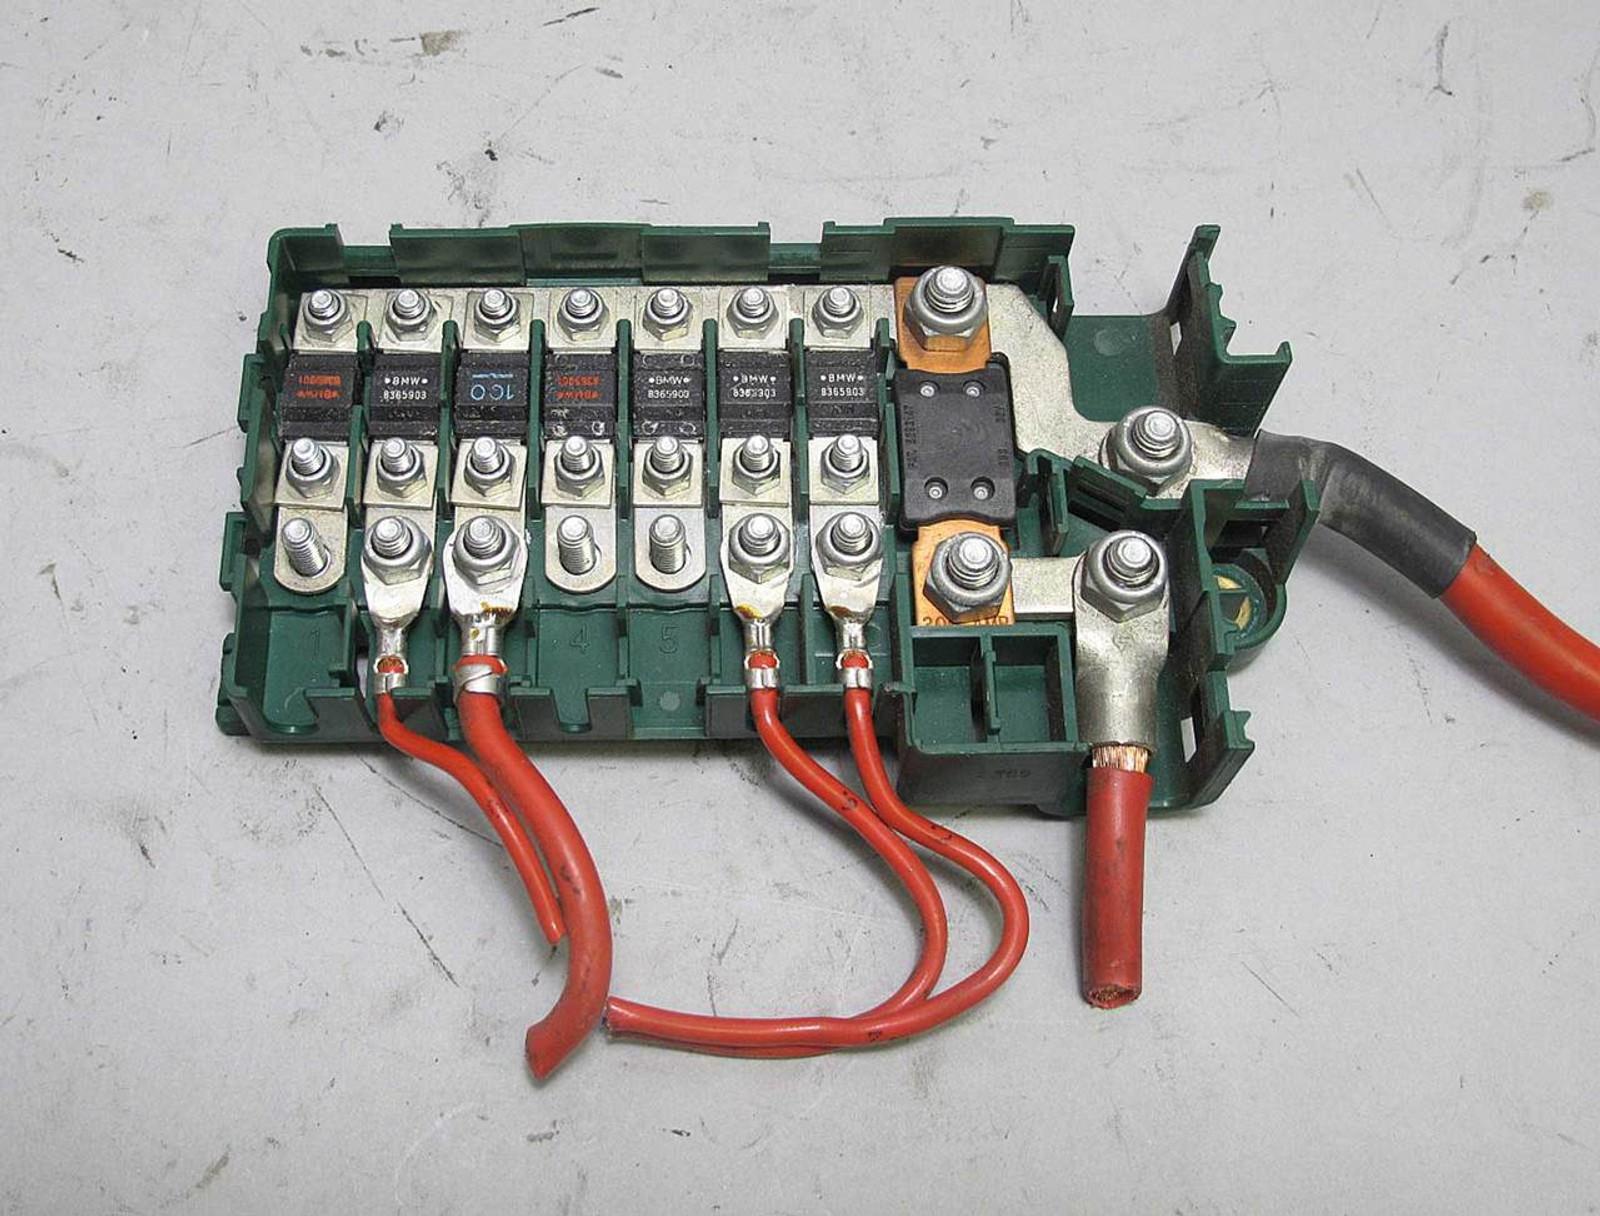 bmw e39 5 series trunk fuse box bus bar power junction green 1995 bmw  [ 1280 x 973 Pixel ]